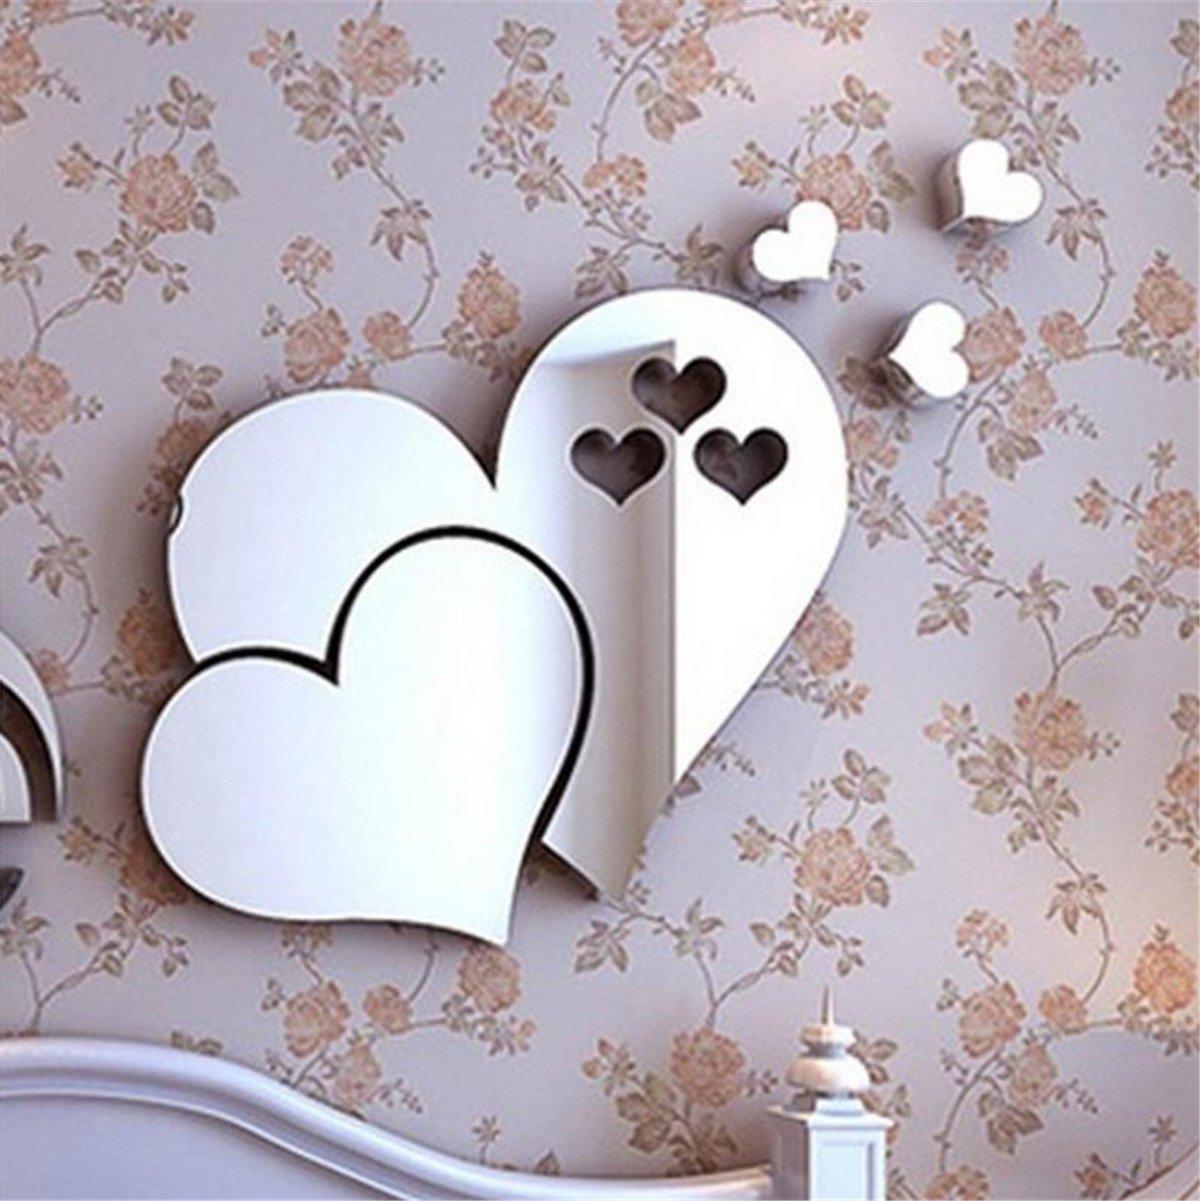 Clearance!! ZOMUSA 3D Mirror Love Hearts Wall Sticker Decal DIY Home Room Art Mural Decor (Silver) ZOMUSA Co. Ltd ZOMUSA_7.21